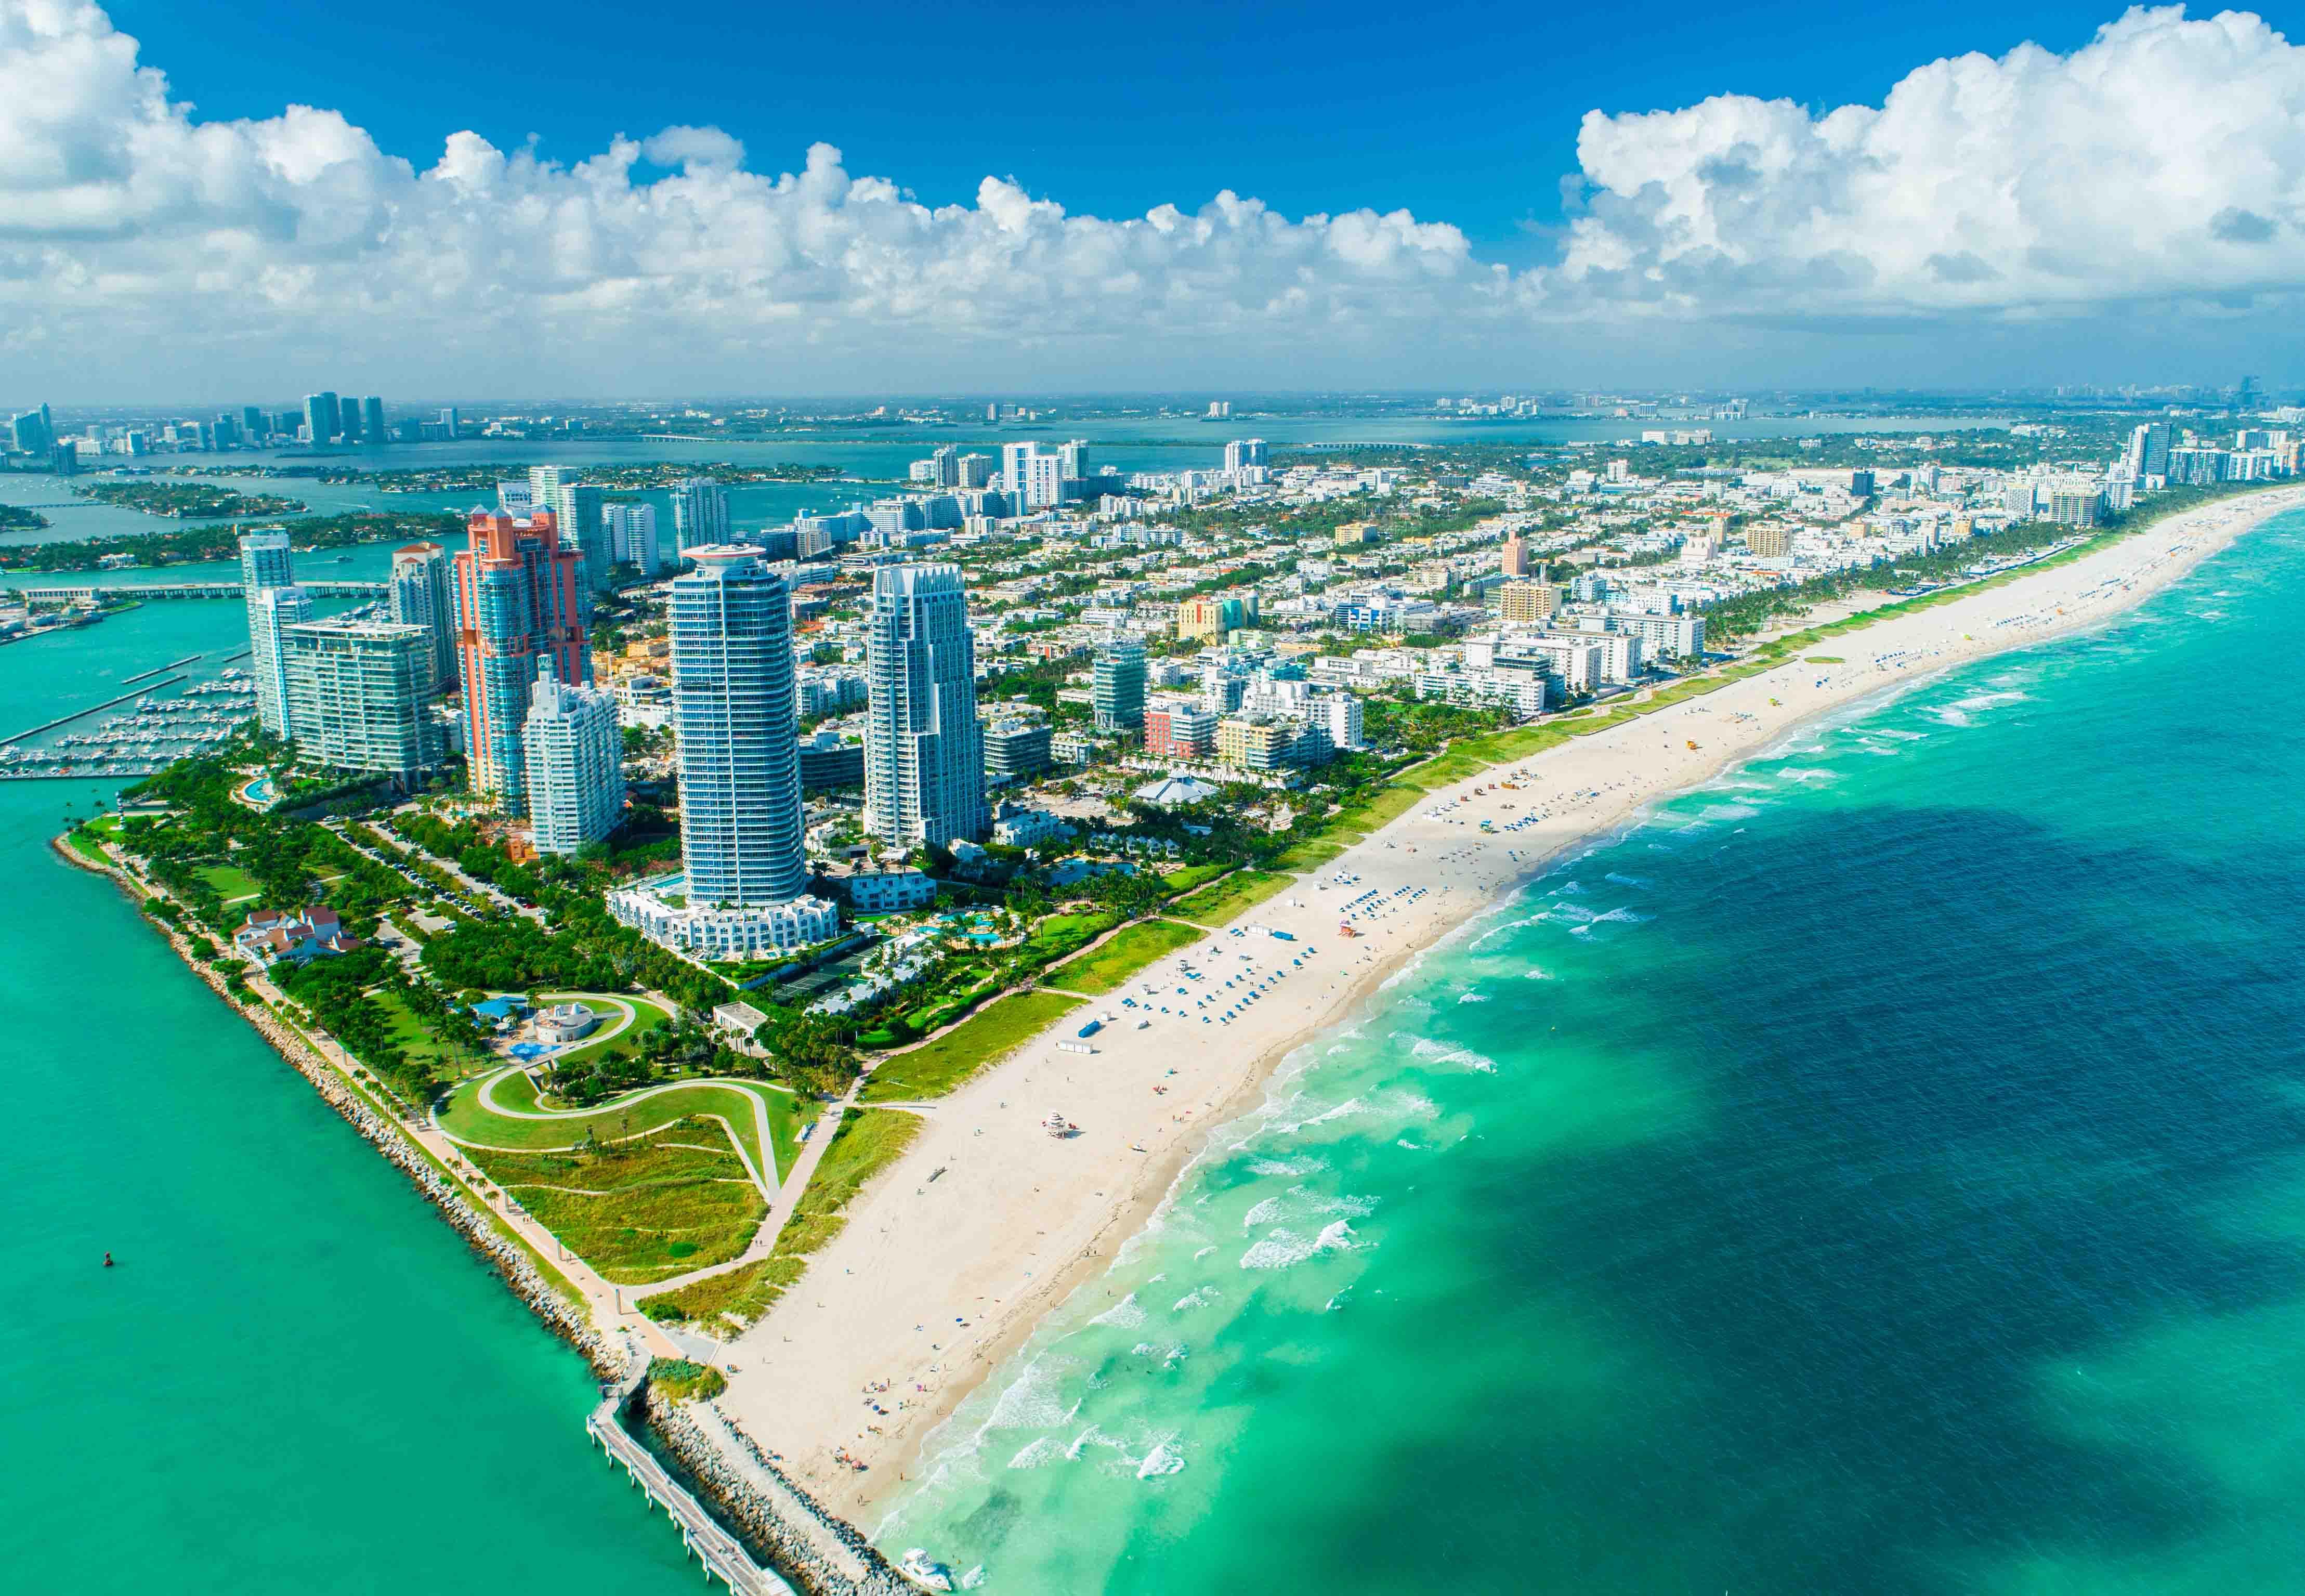 https://firstglobalschool.it/Miami